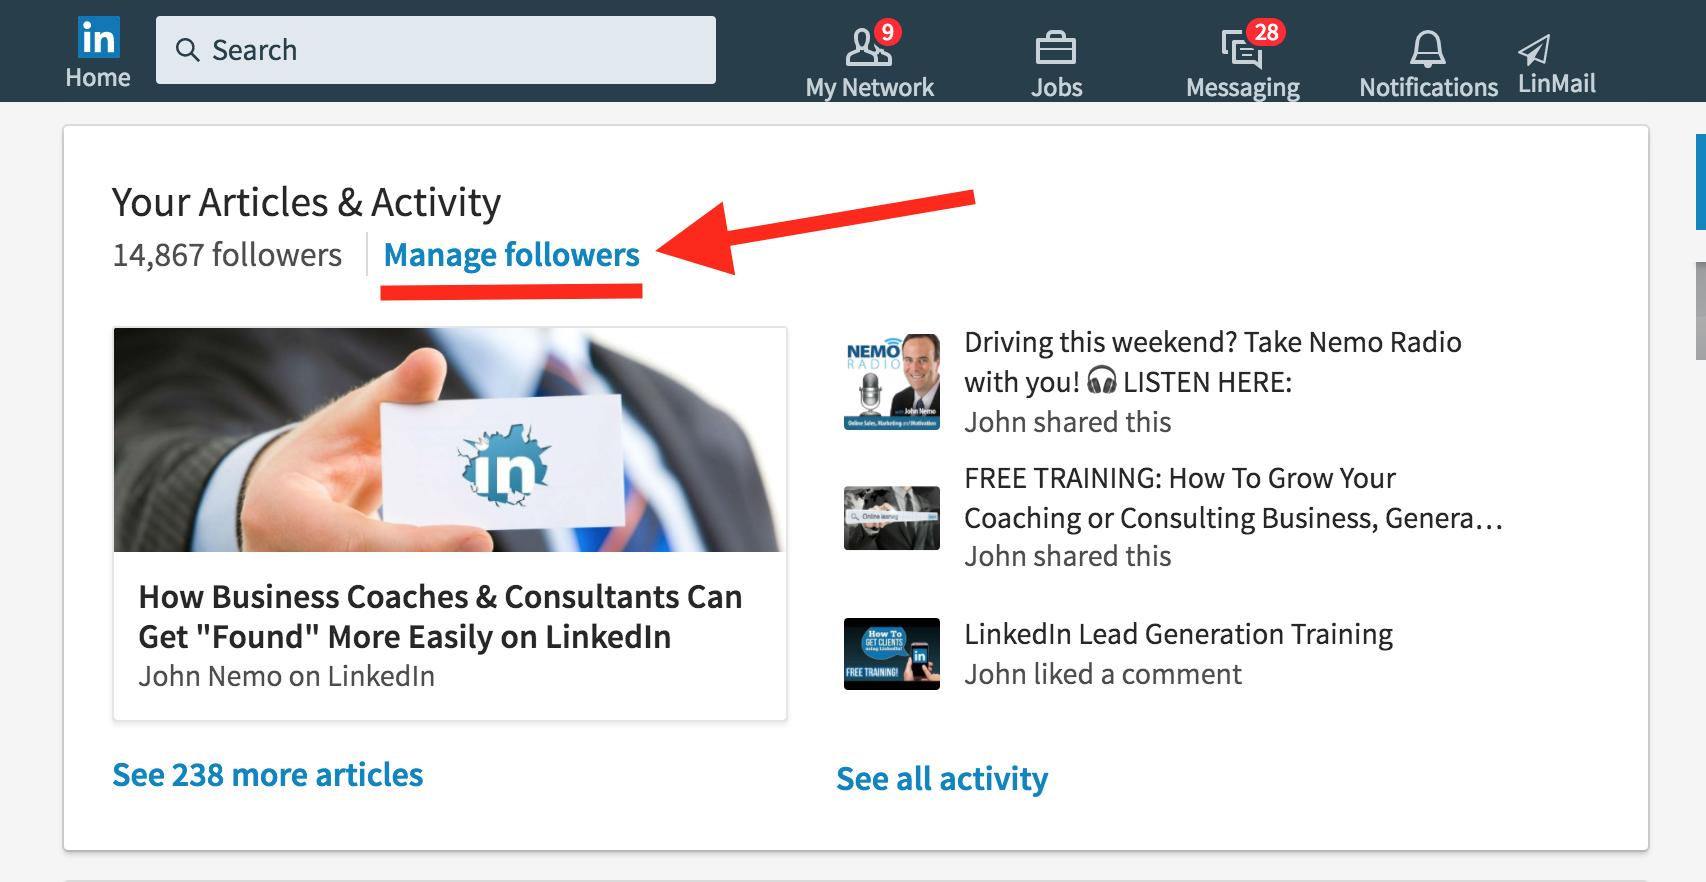 LinkedIn Lead Generation Tips + Training (Video)